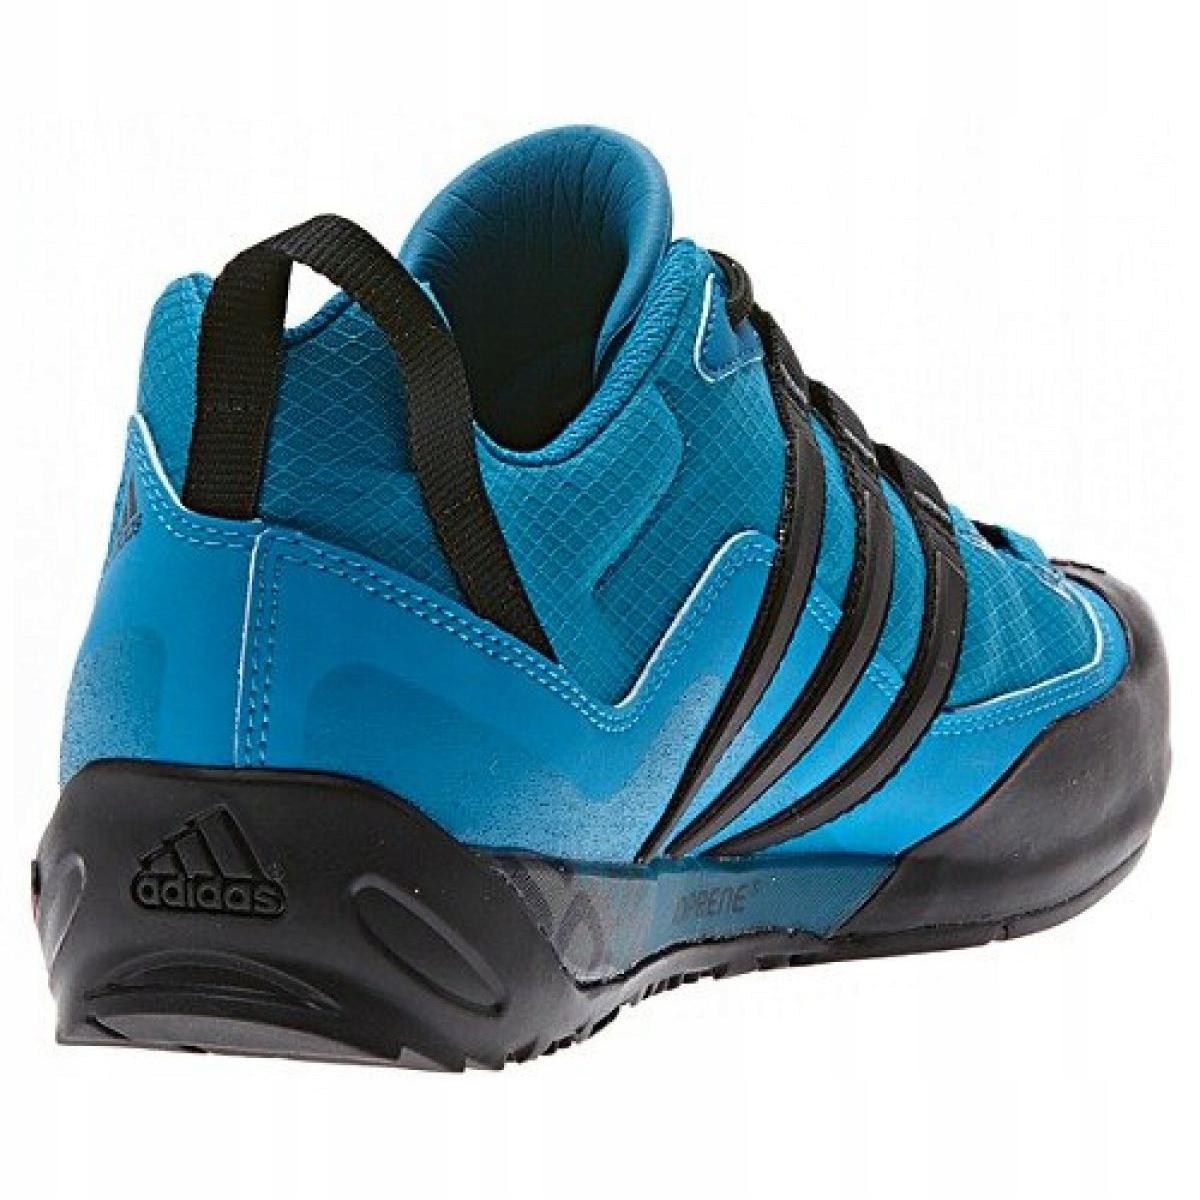 adidas terrex solo shoes men